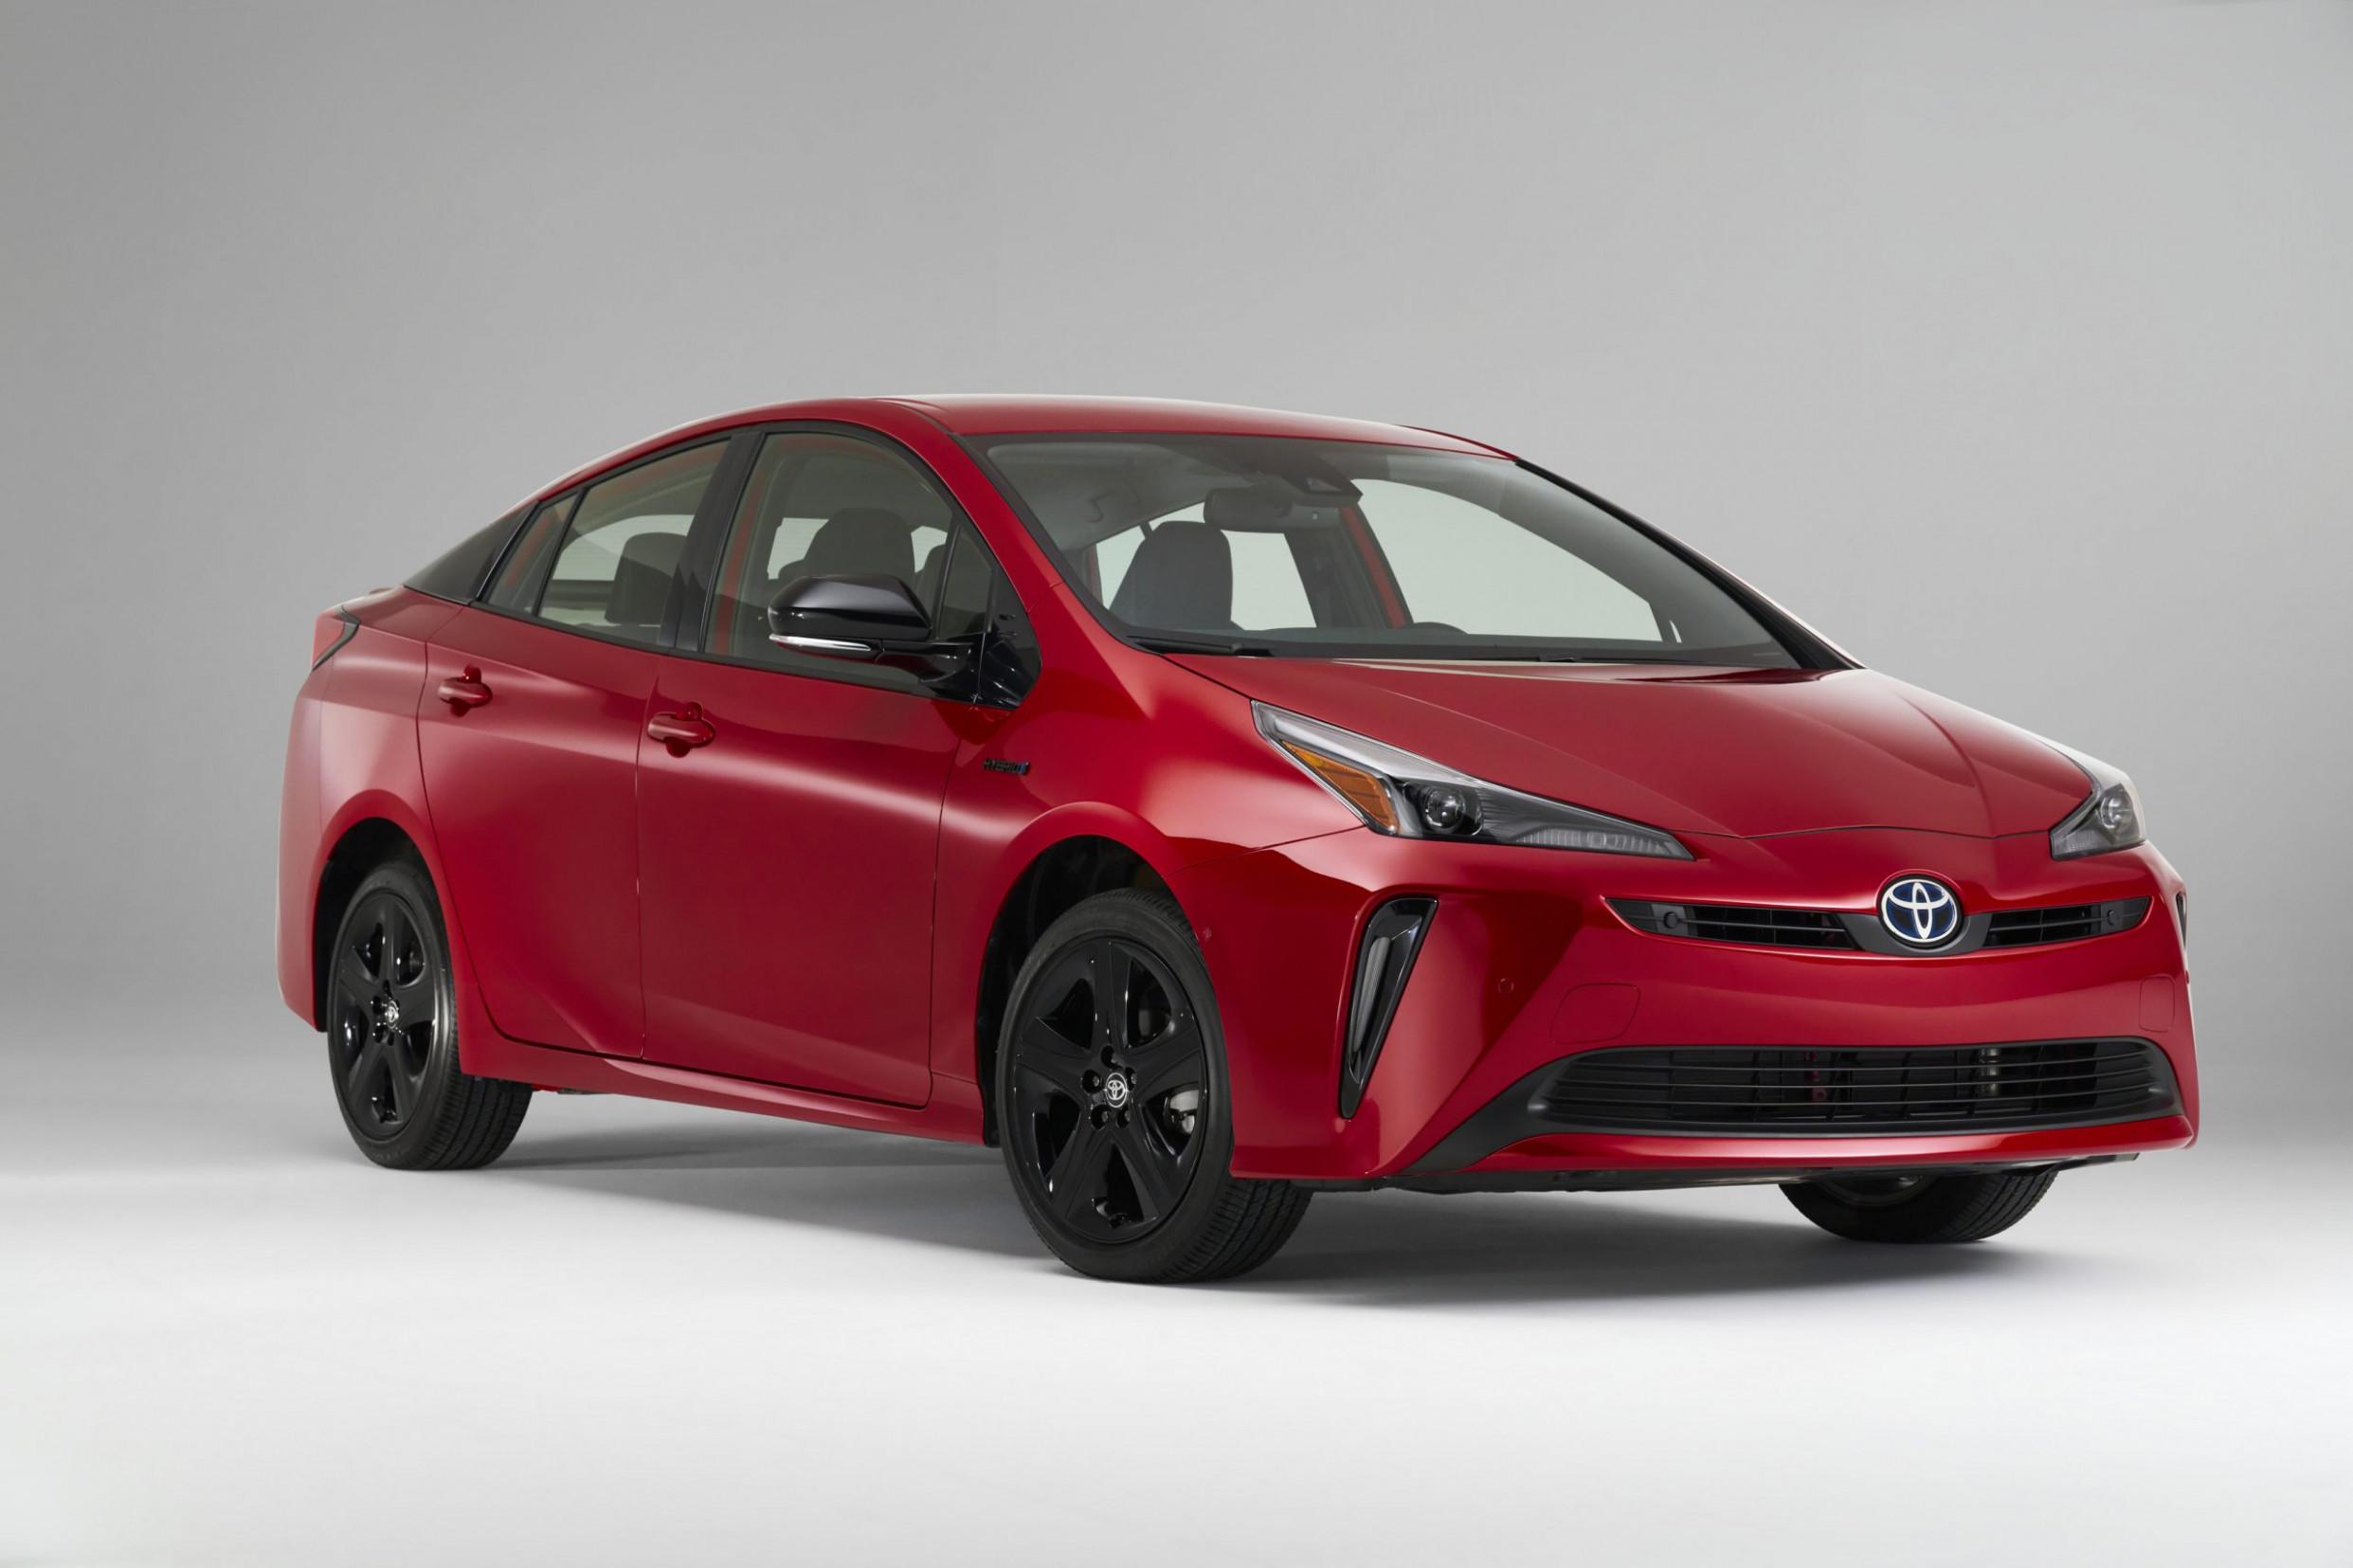 Performance 2022 Spy Shots Toyota Prius